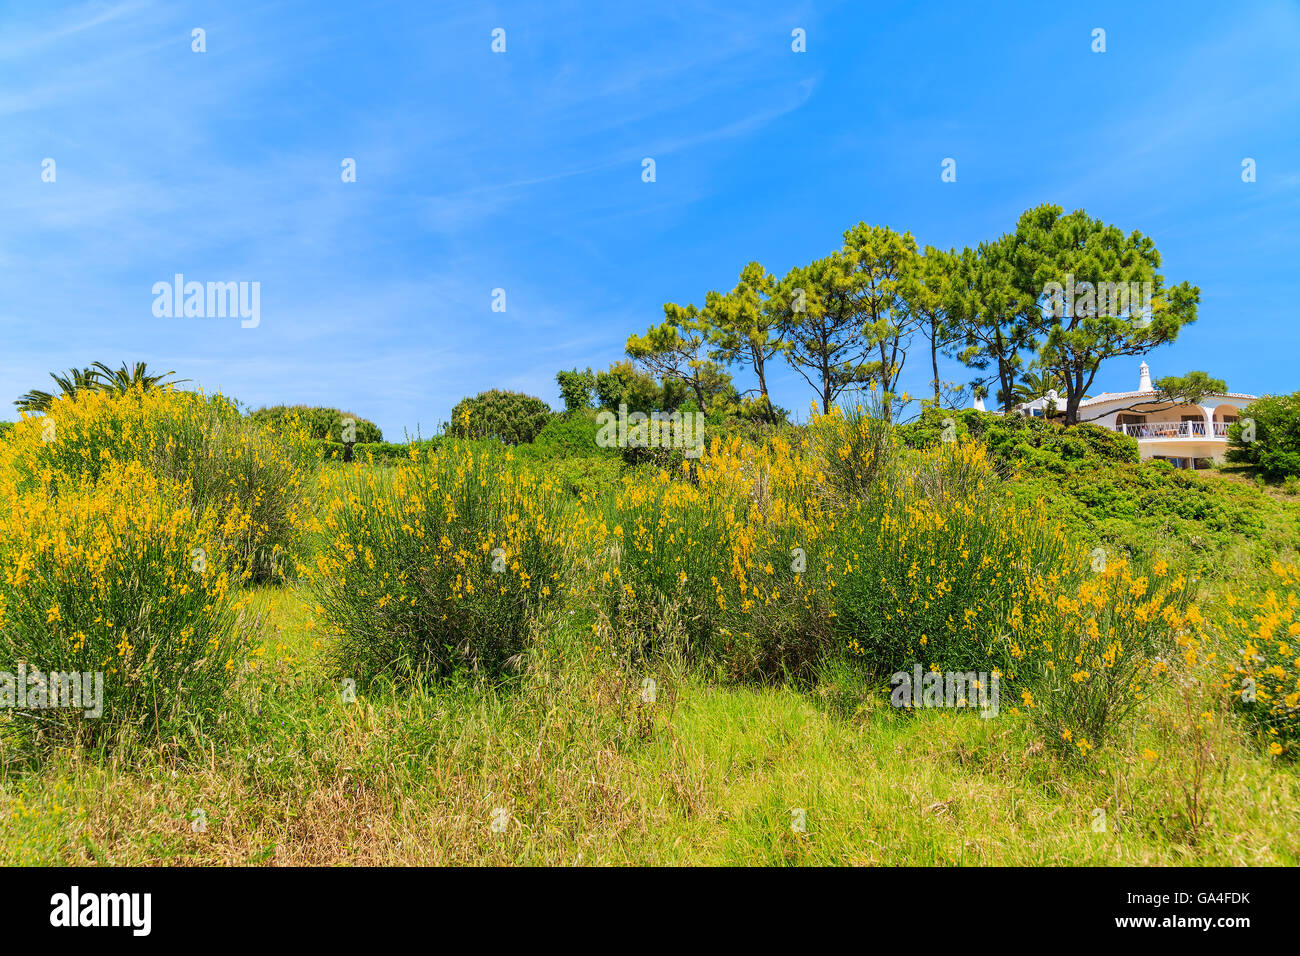 Yellow flowers on green meadow in spring season, Algarve region, Portugal Stock Photo